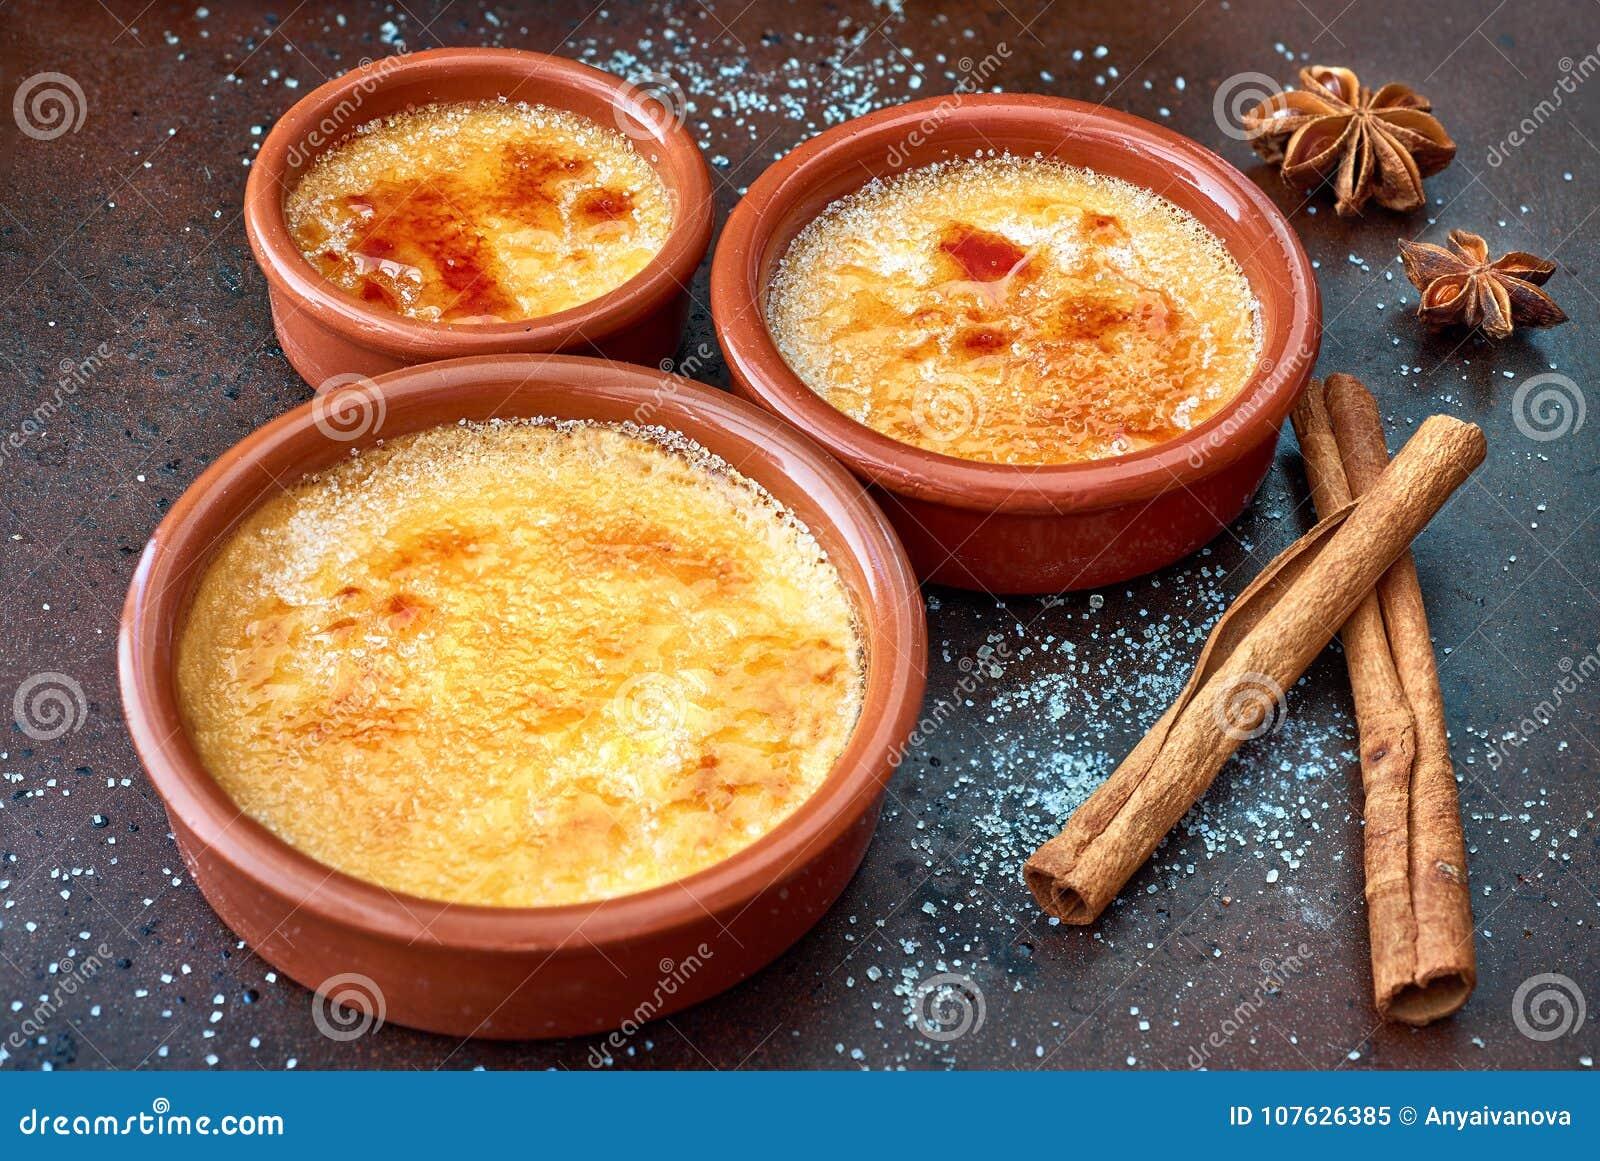 Crema quemada de la nata, quemada poner crema quemada en el terracota que cuece el SID